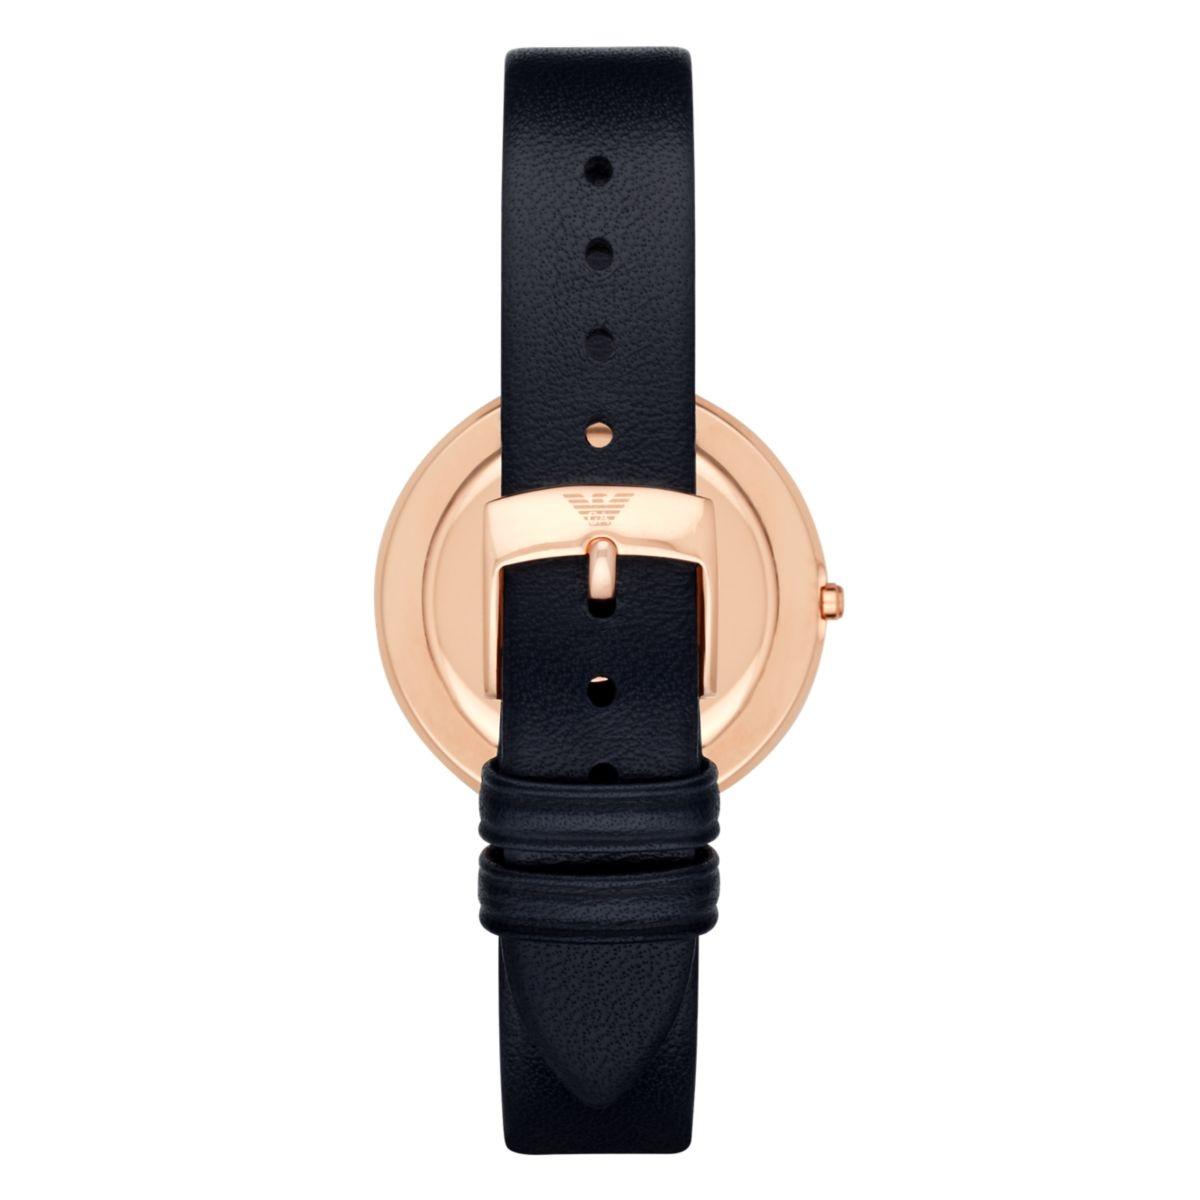 Женские часы Emporio Armani AR7434 Мужские часы Armand Nicolet A714AGN-GR-MA4710GN